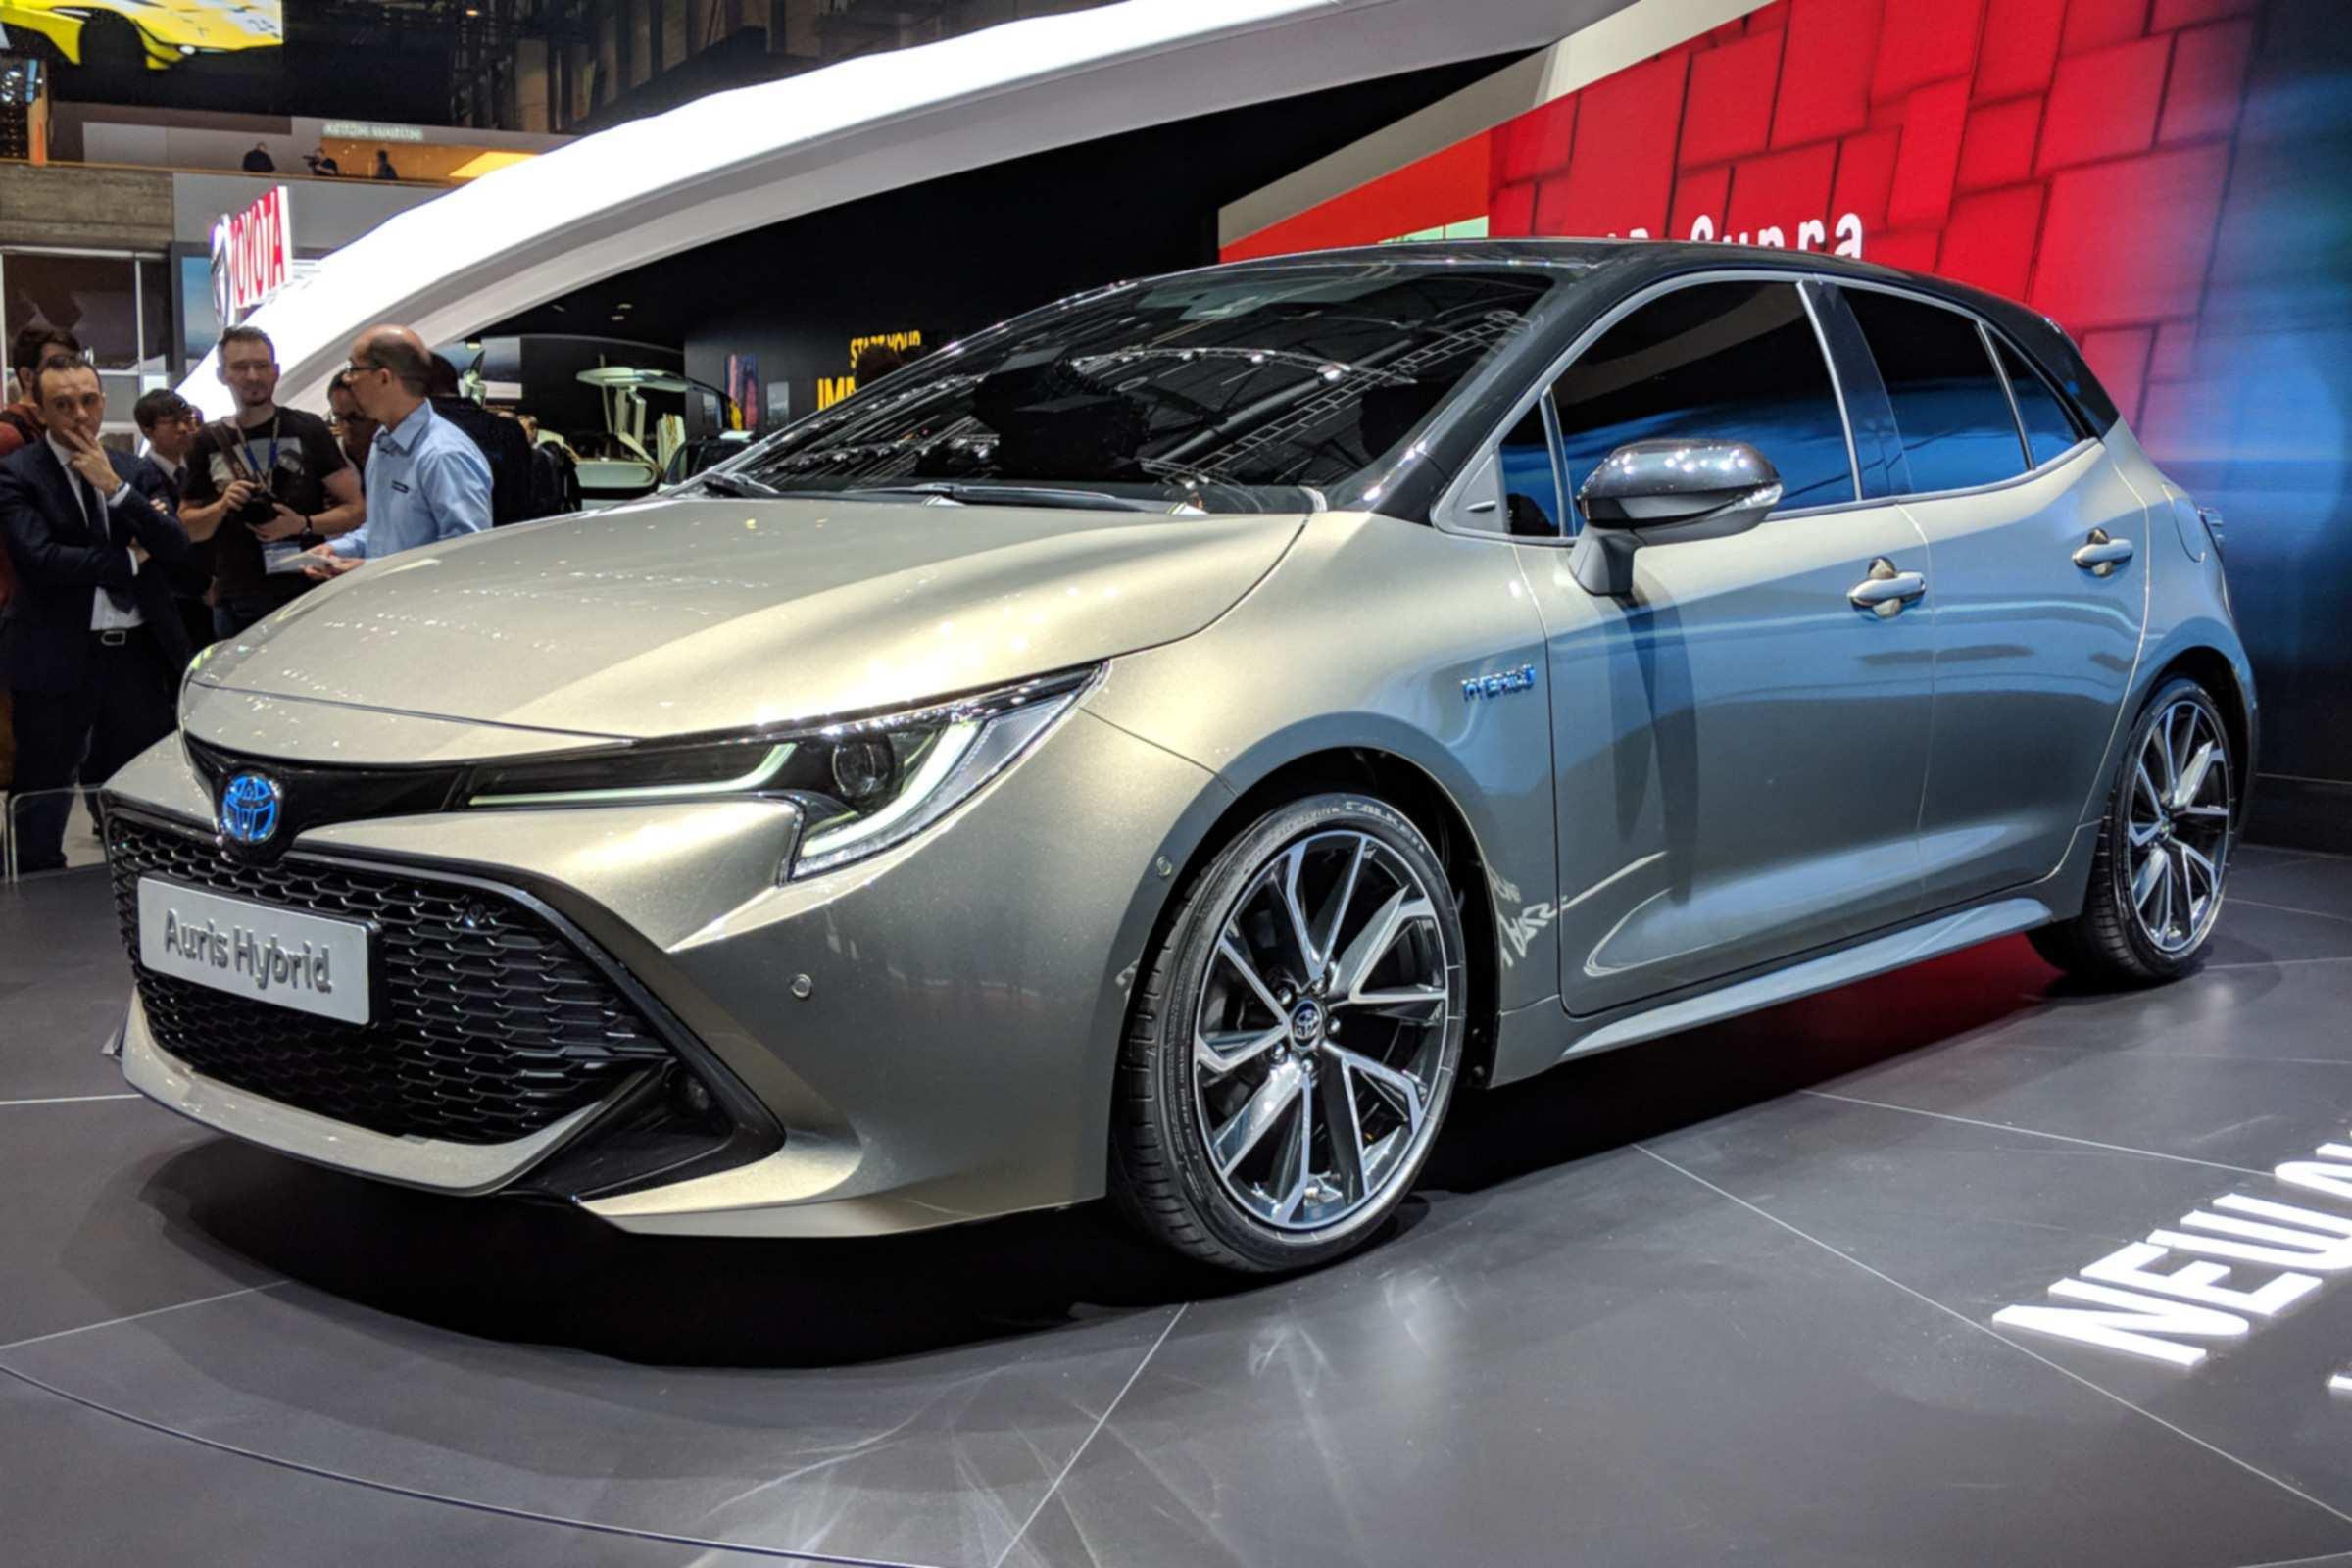 22 Best Review Toyota Corolla 2020 Uk Configurations for Toyota Corolla 2020 Uk